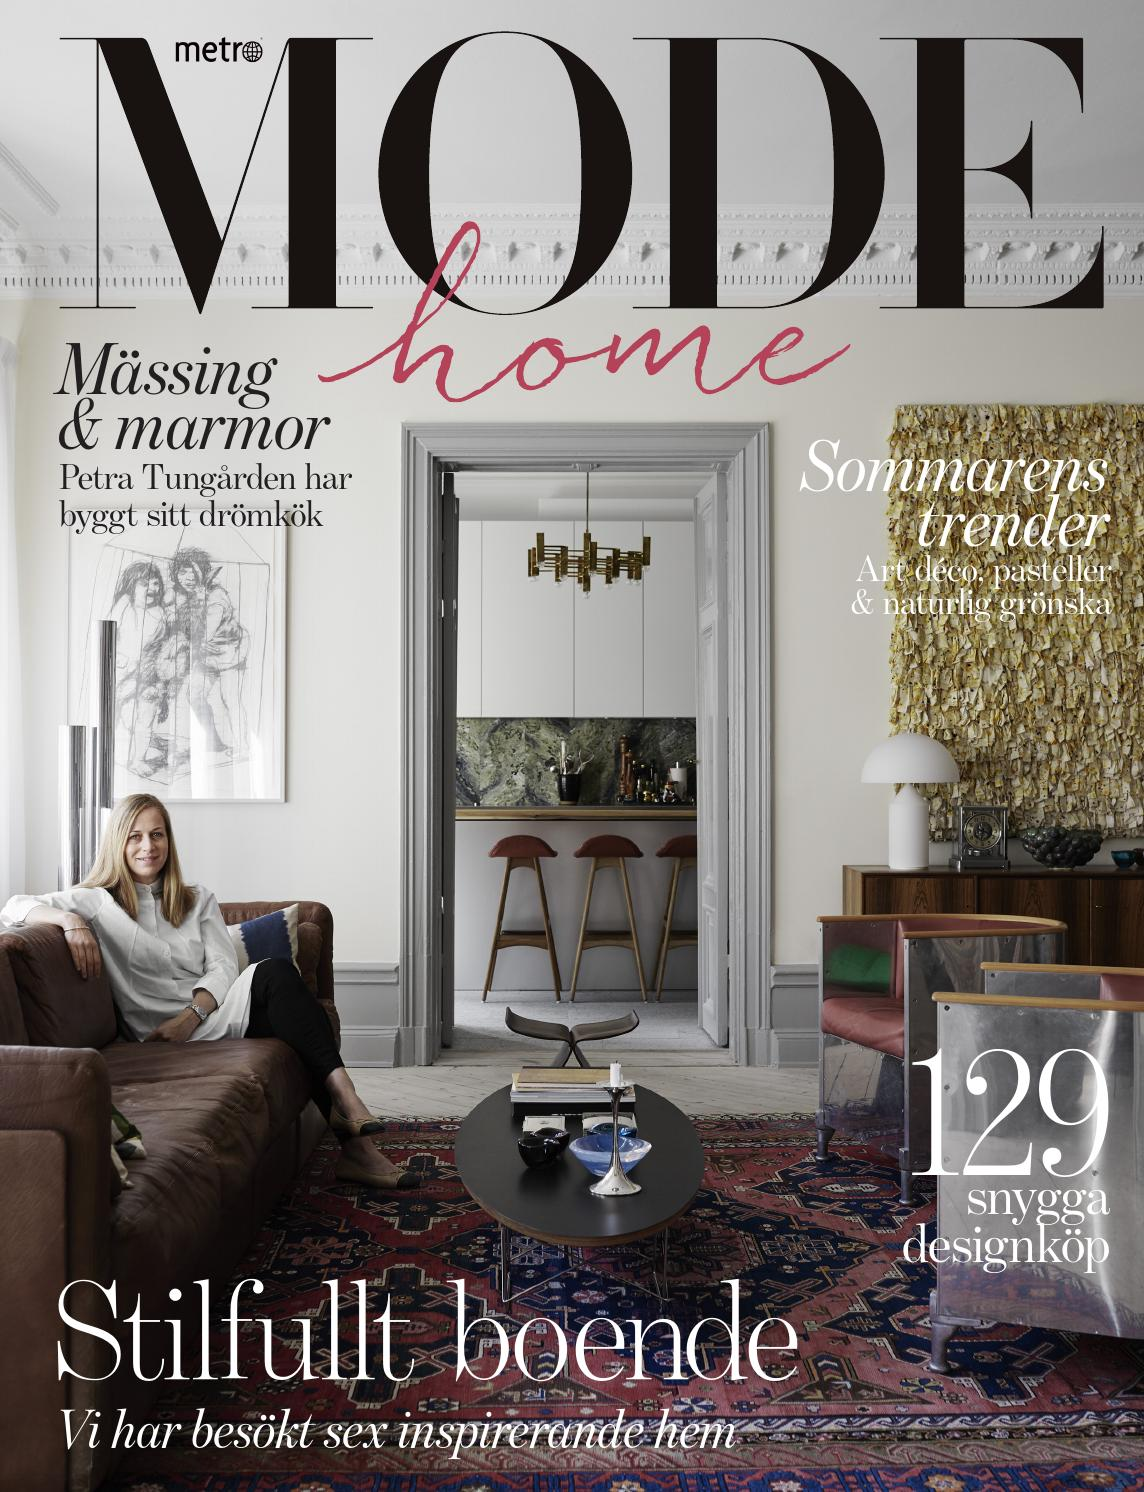 Metro mode home 2016 by metro mode   issuu